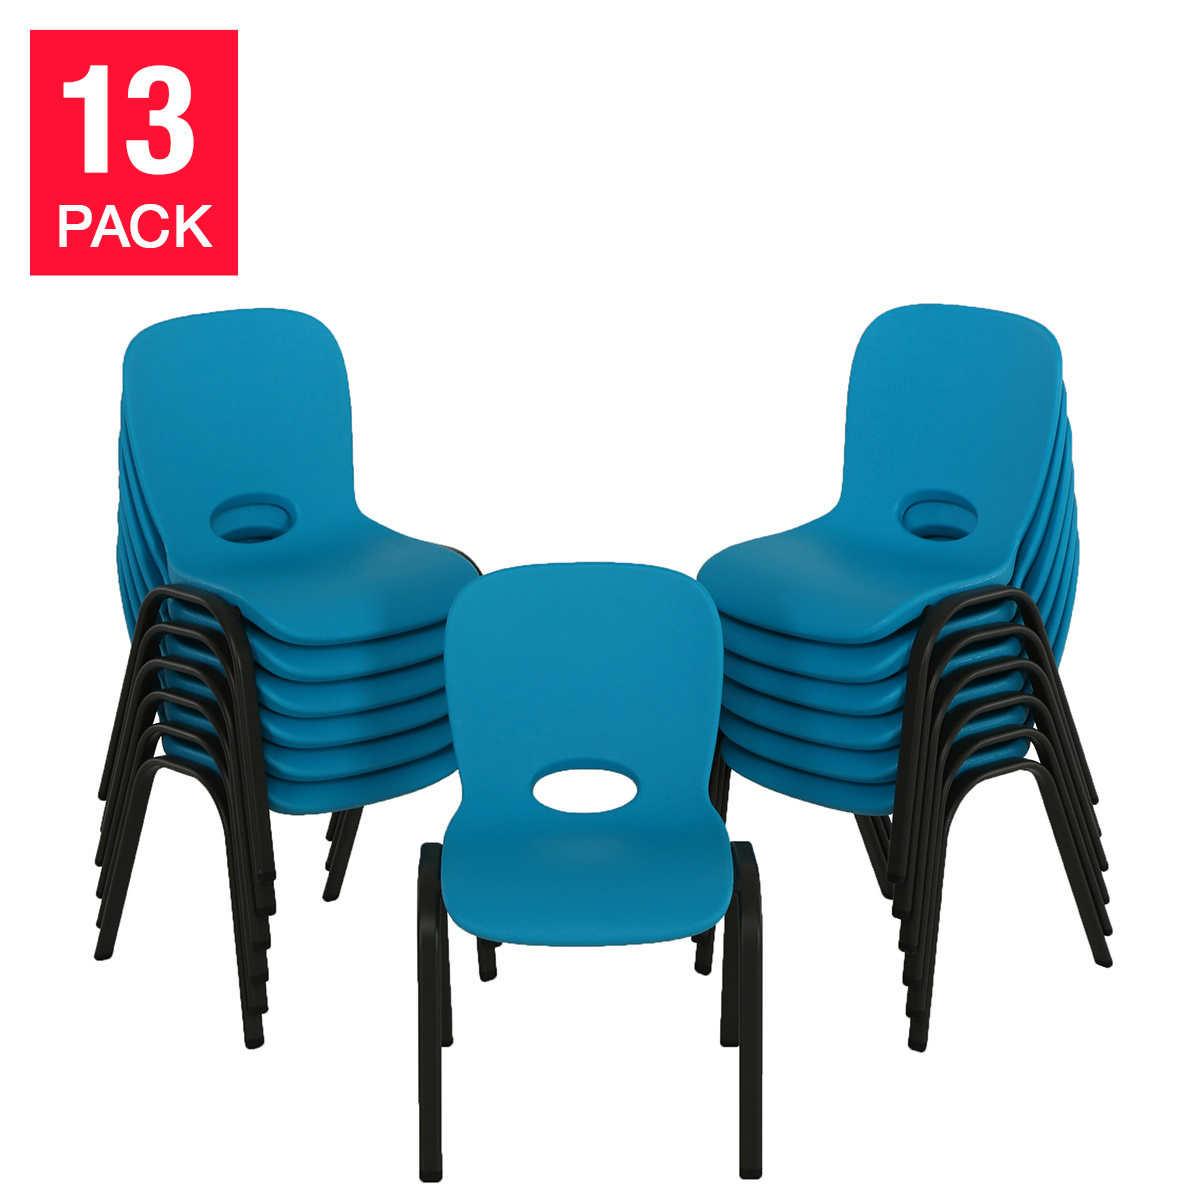 Kids stacking chairs - Kids Stacking Chairs 5